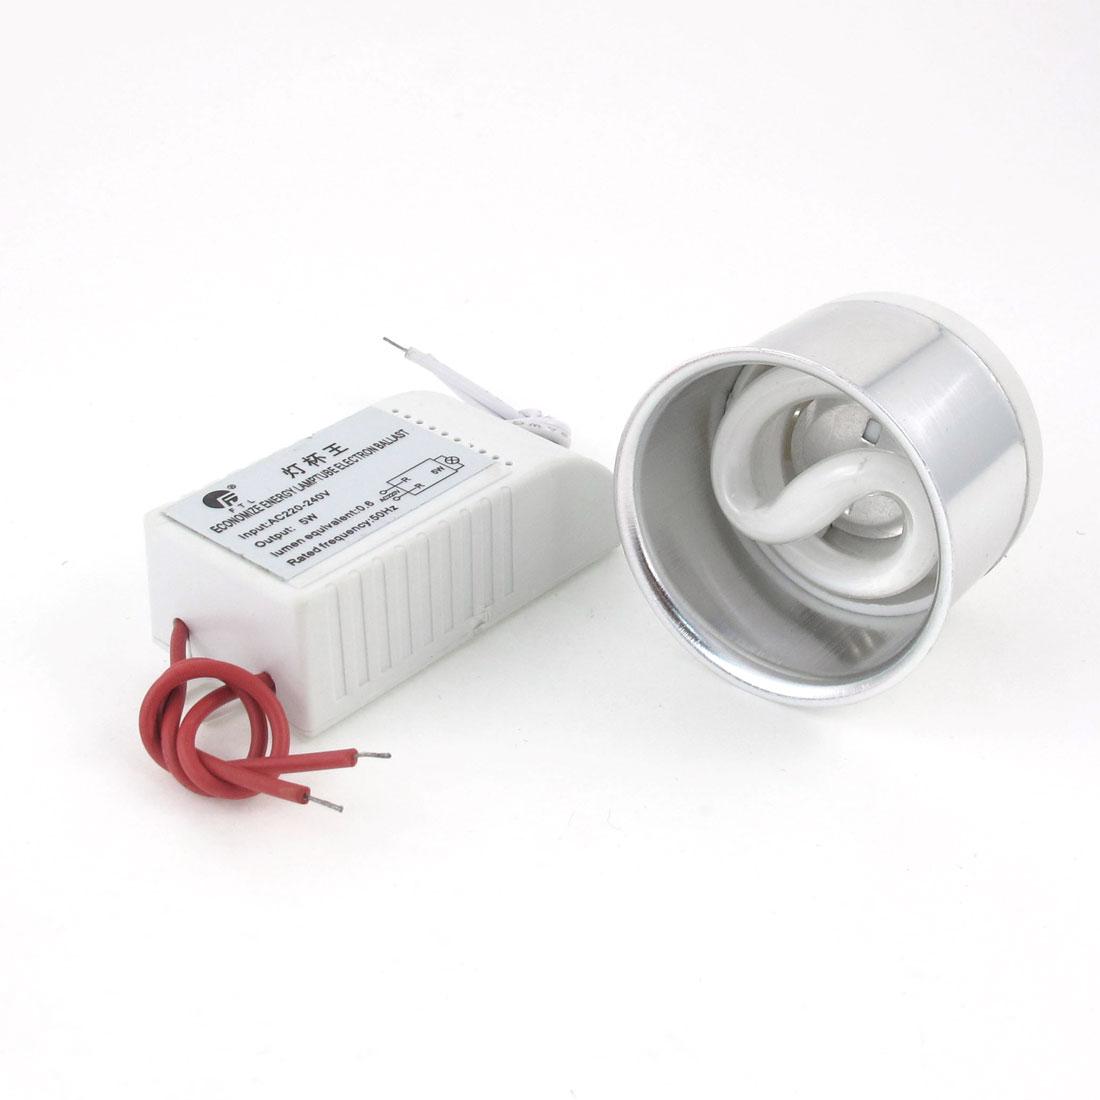 AC 220-240V 5W Economize Energy Lamp Tube Fluorescent Lamps Electronic Ballast